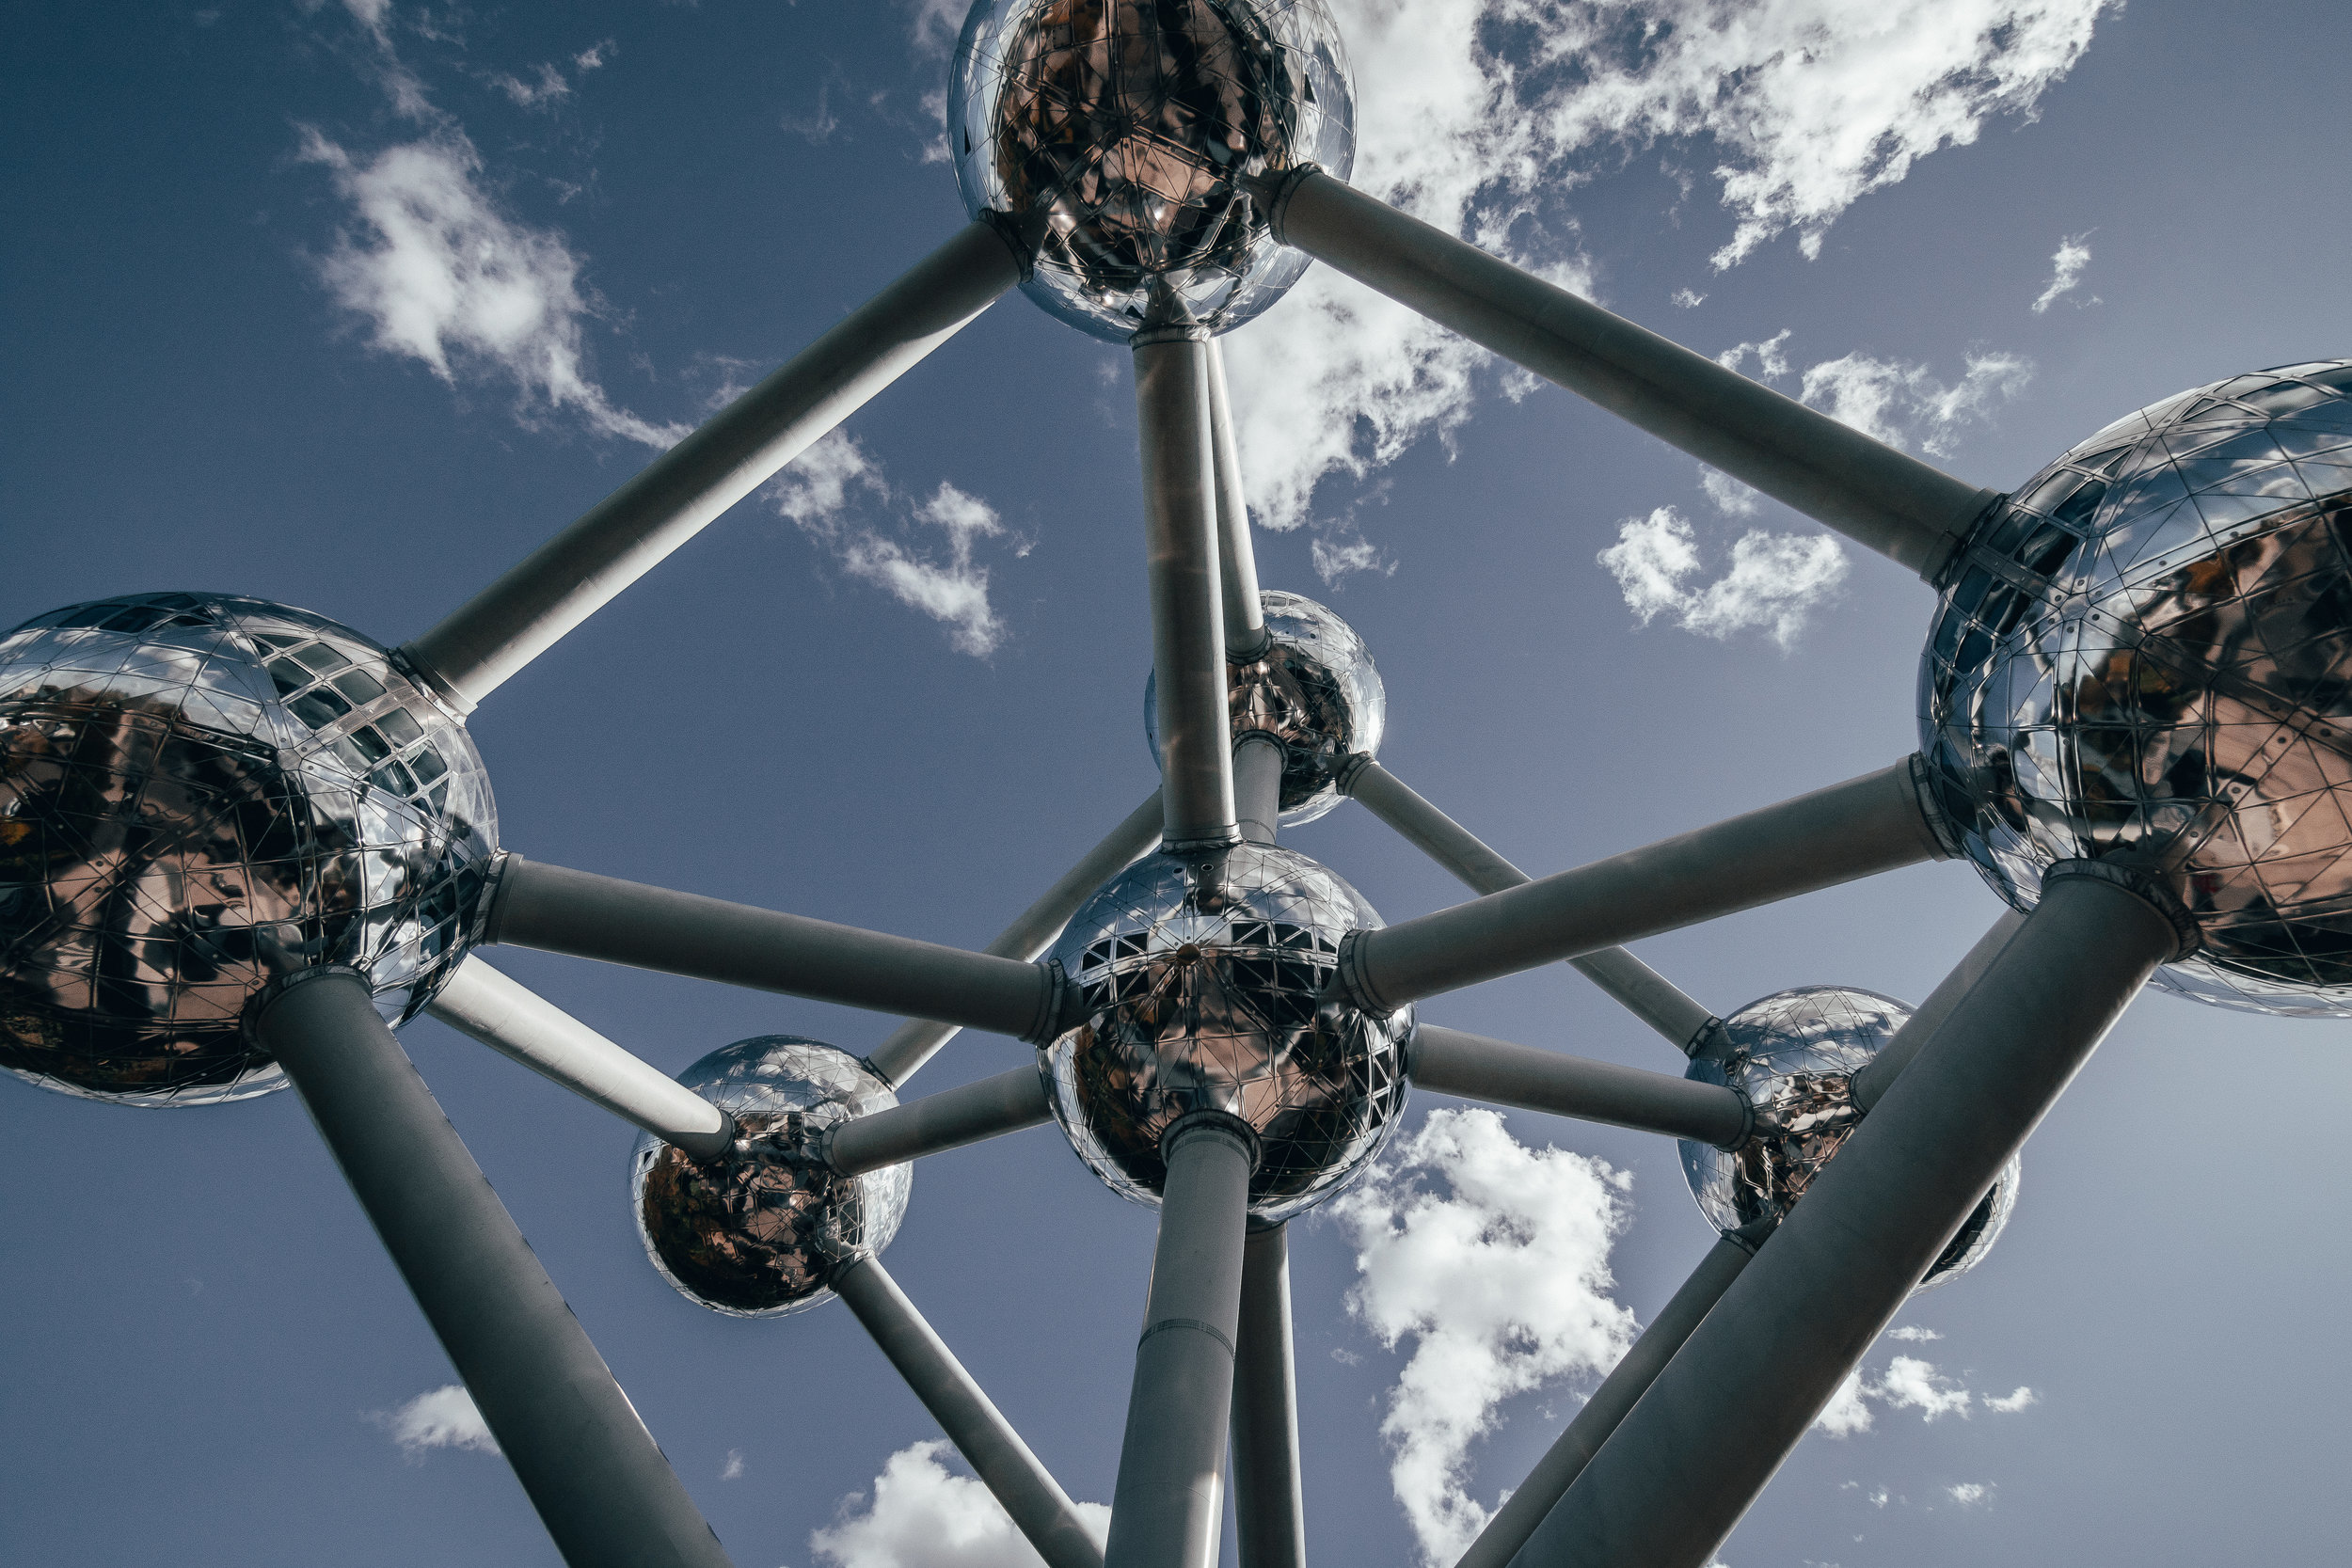 EFLCIN 2019 Brussels, Belgium